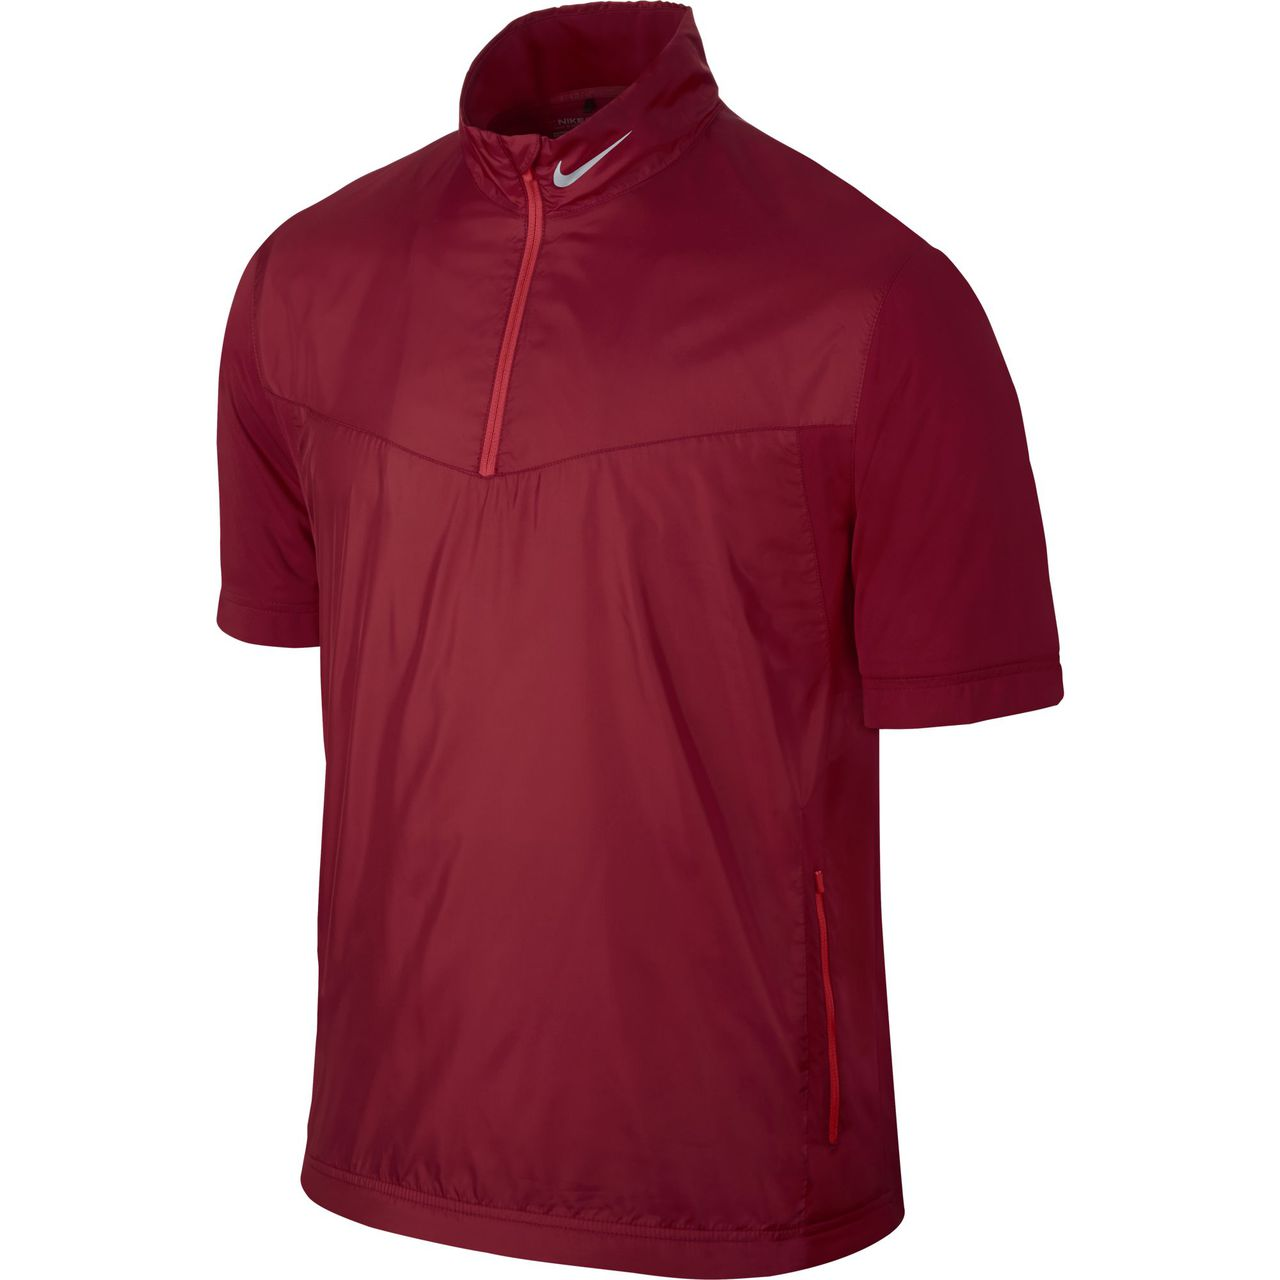 Nike Golf Shield SS 1/2-Zip CLASSIC CHARCL/BLACK/Grey XL - Gym Red/Daring  Red/Wolf Grey